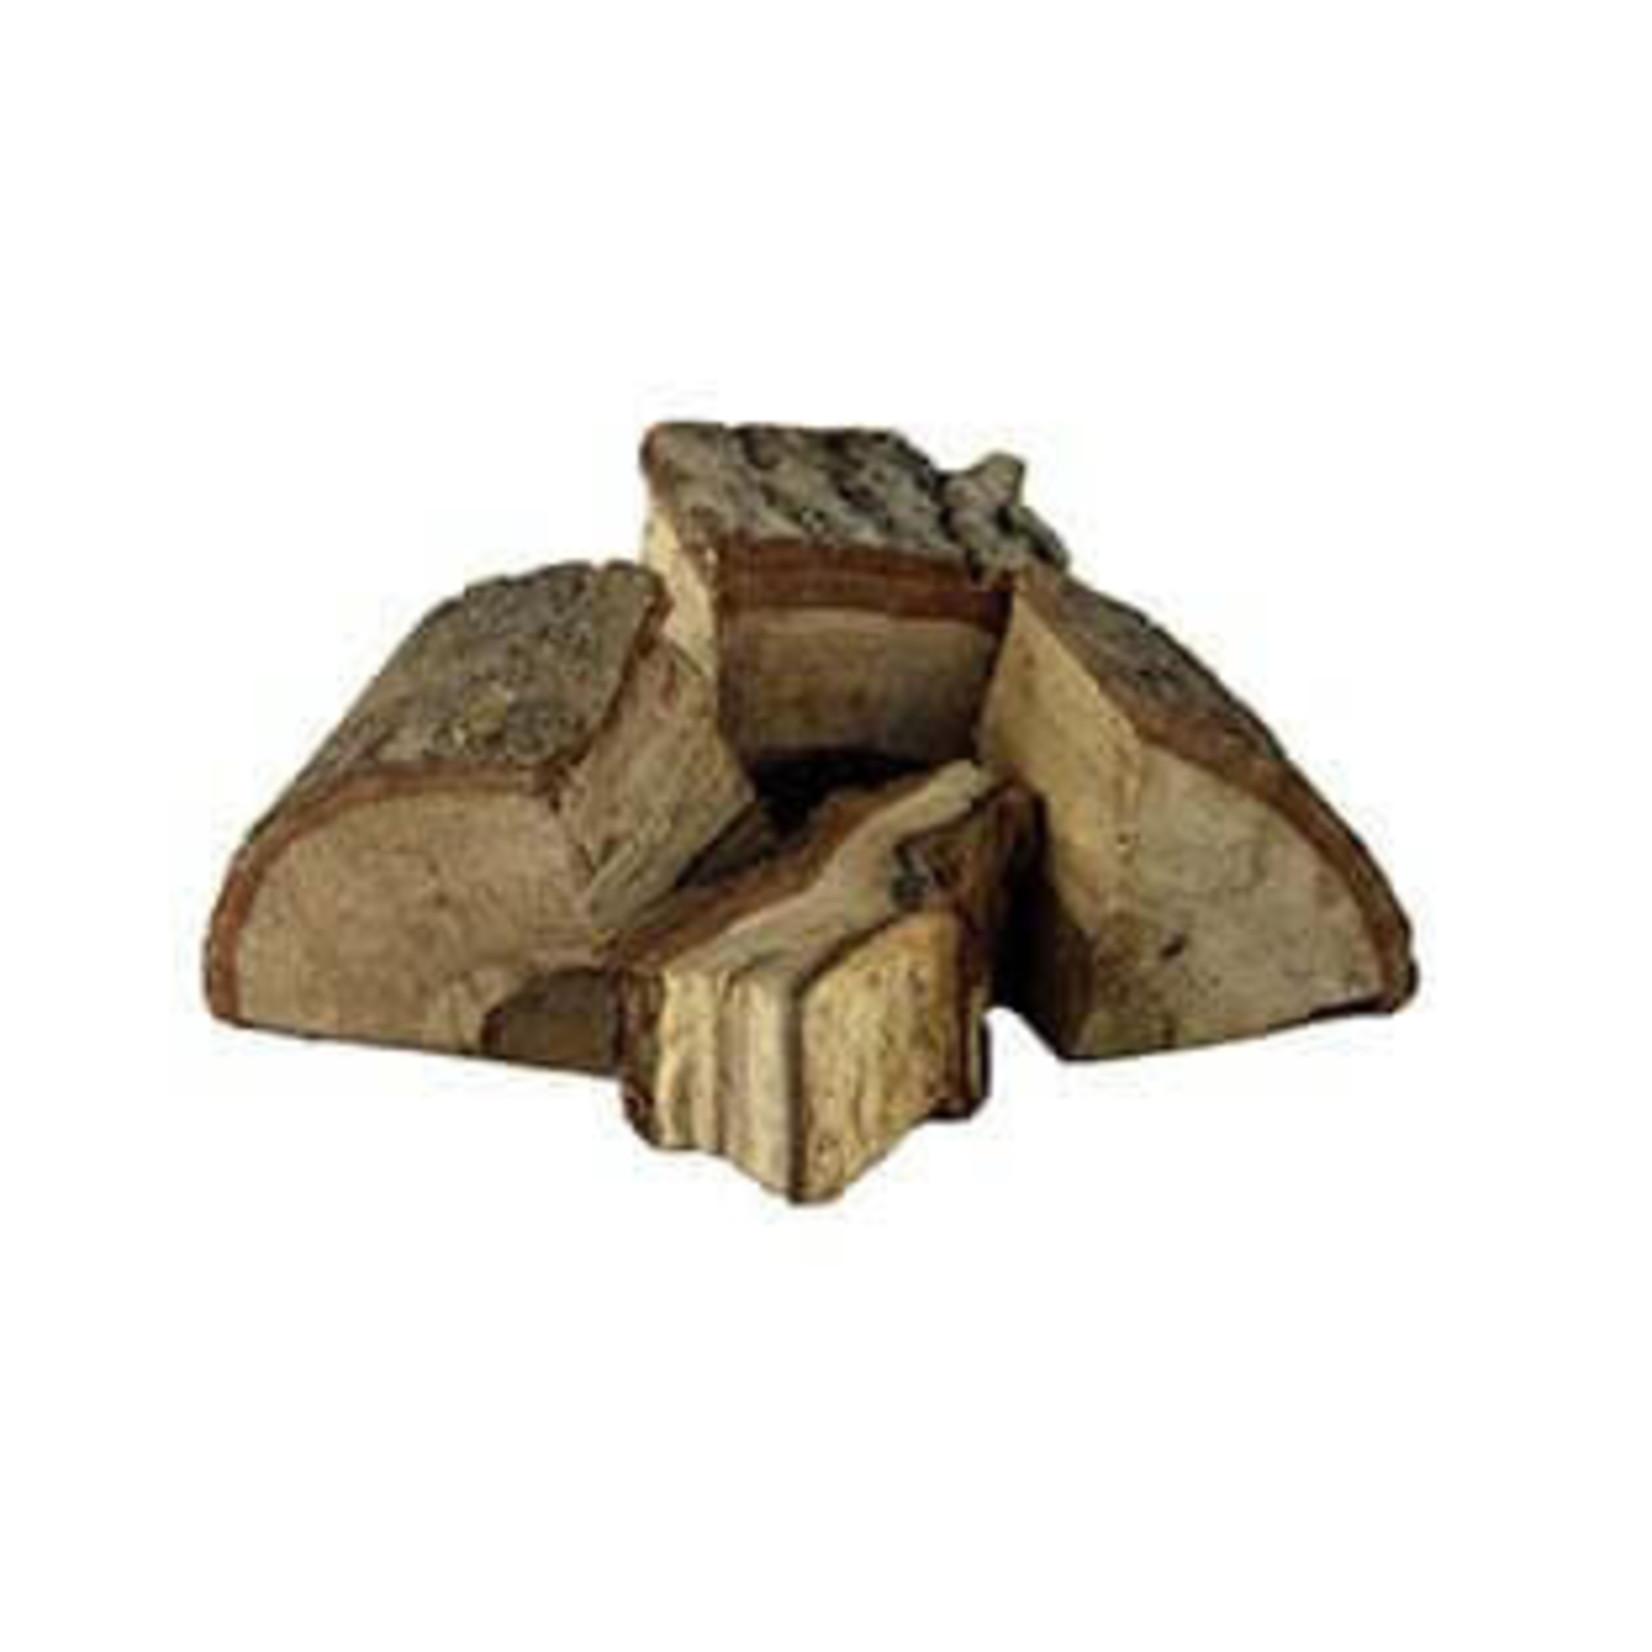 BBQ Flavour BBQ Flavour rookhout chunck Hickory 2.4 kg